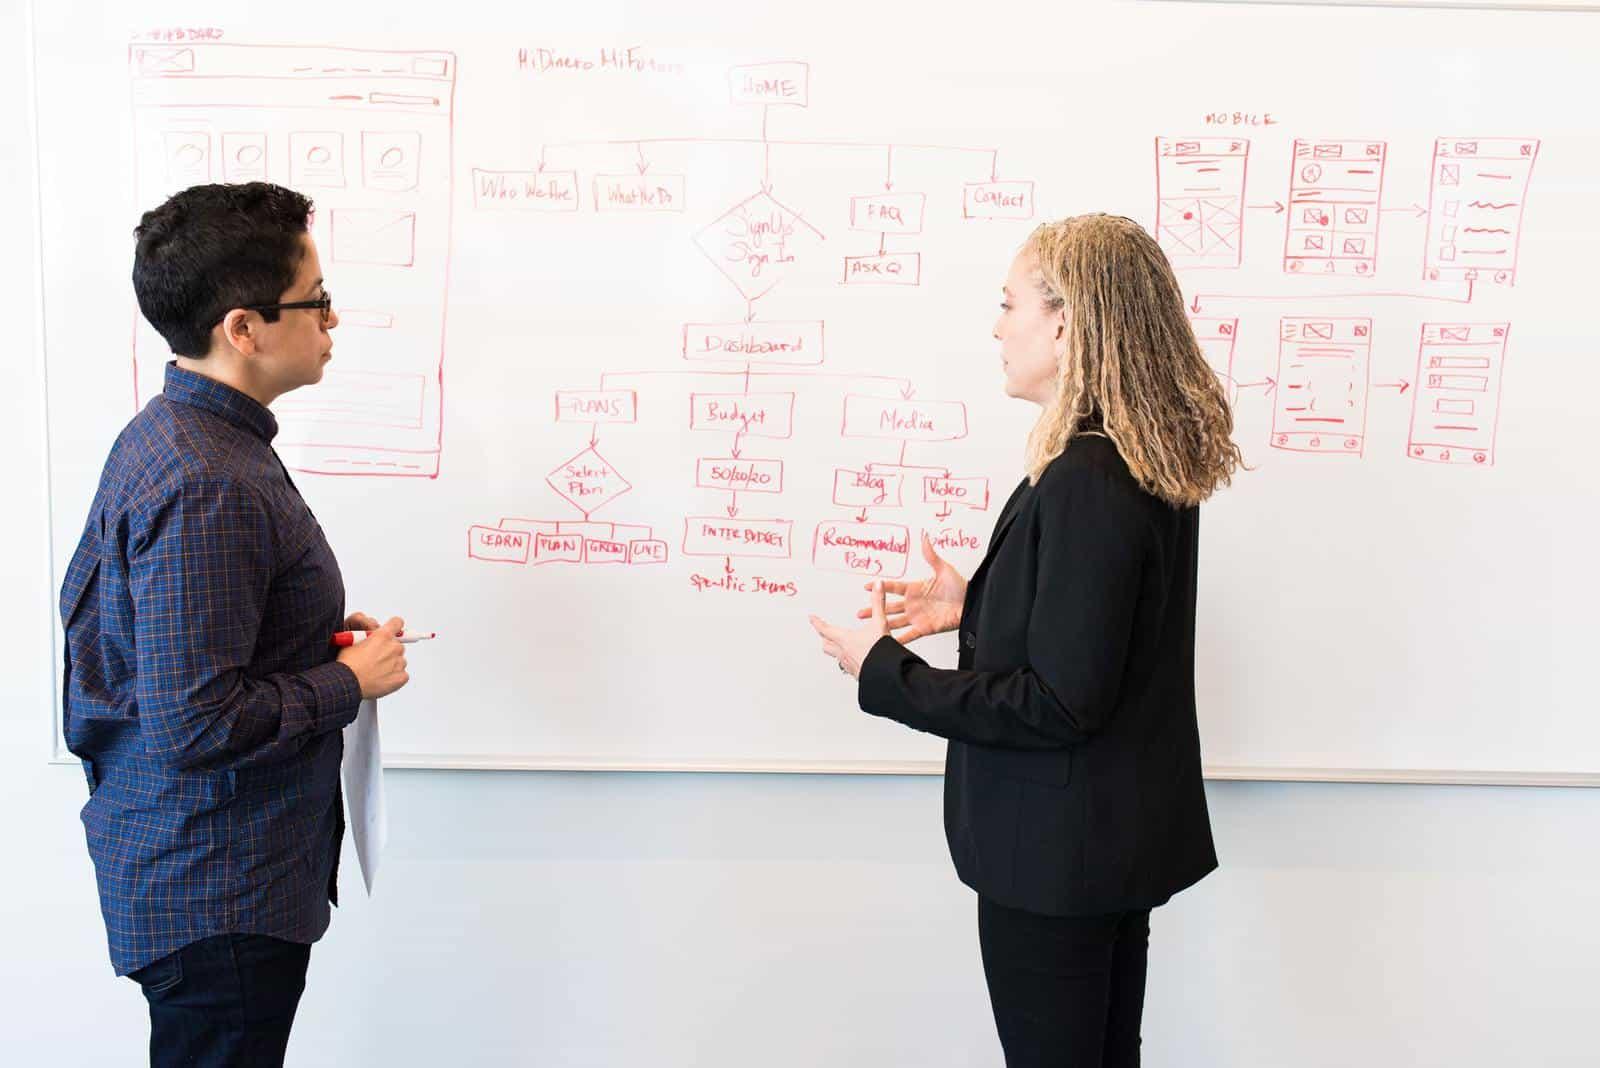 Two women in front of whiteboard